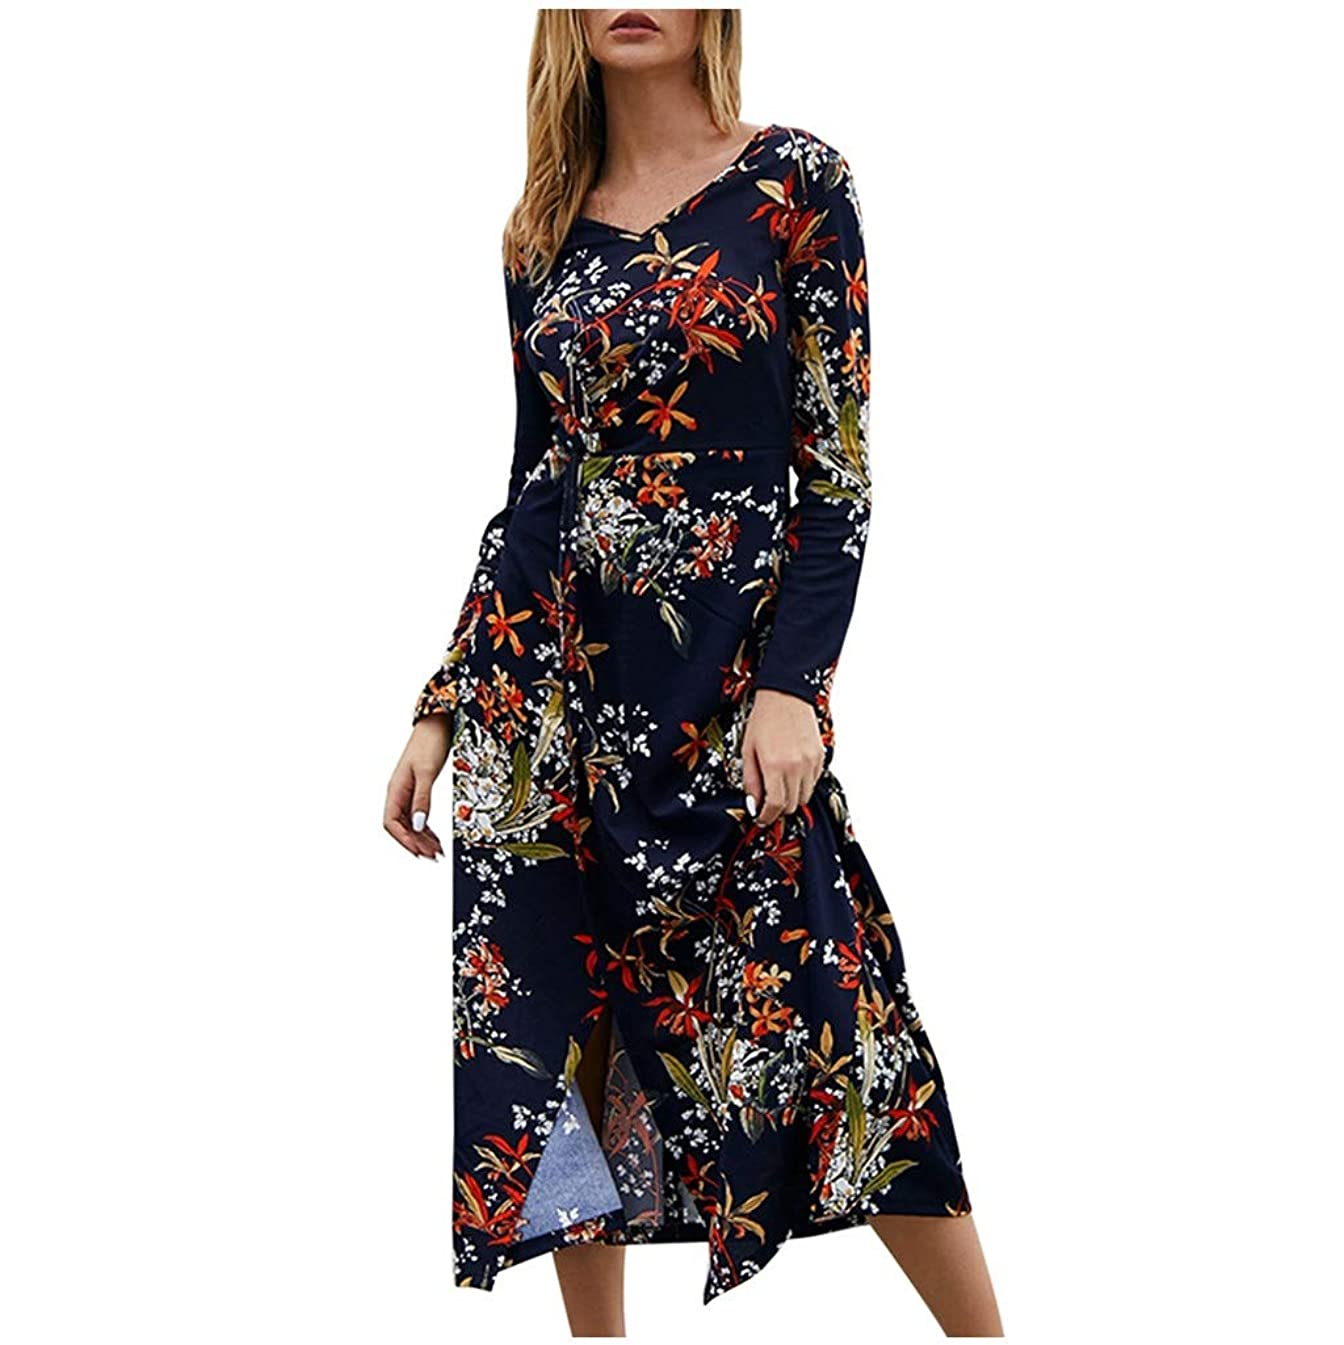 YKARITIANNA Fashion Women Slim Sexy O-Neck Solid Color Bow Print Long Sleeve 2019 Summer